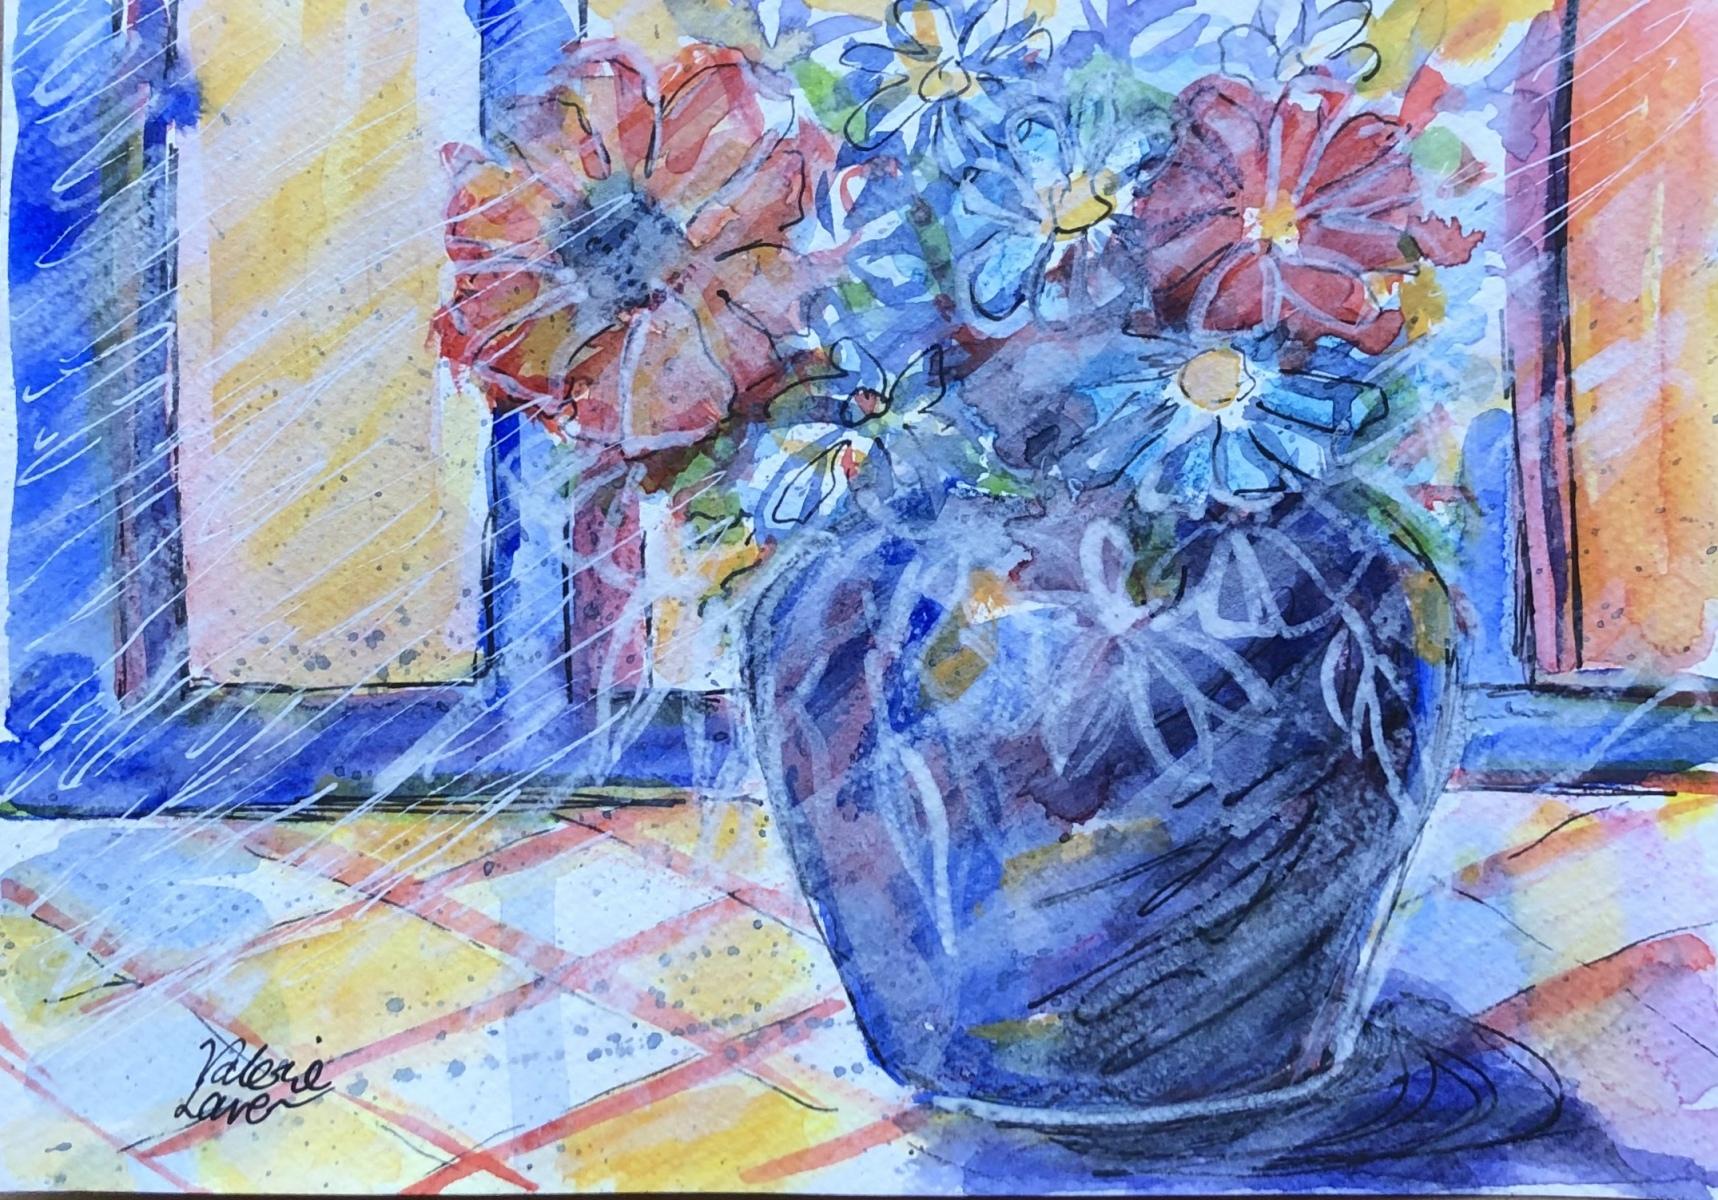 Valerie Laver - The Blue Vase